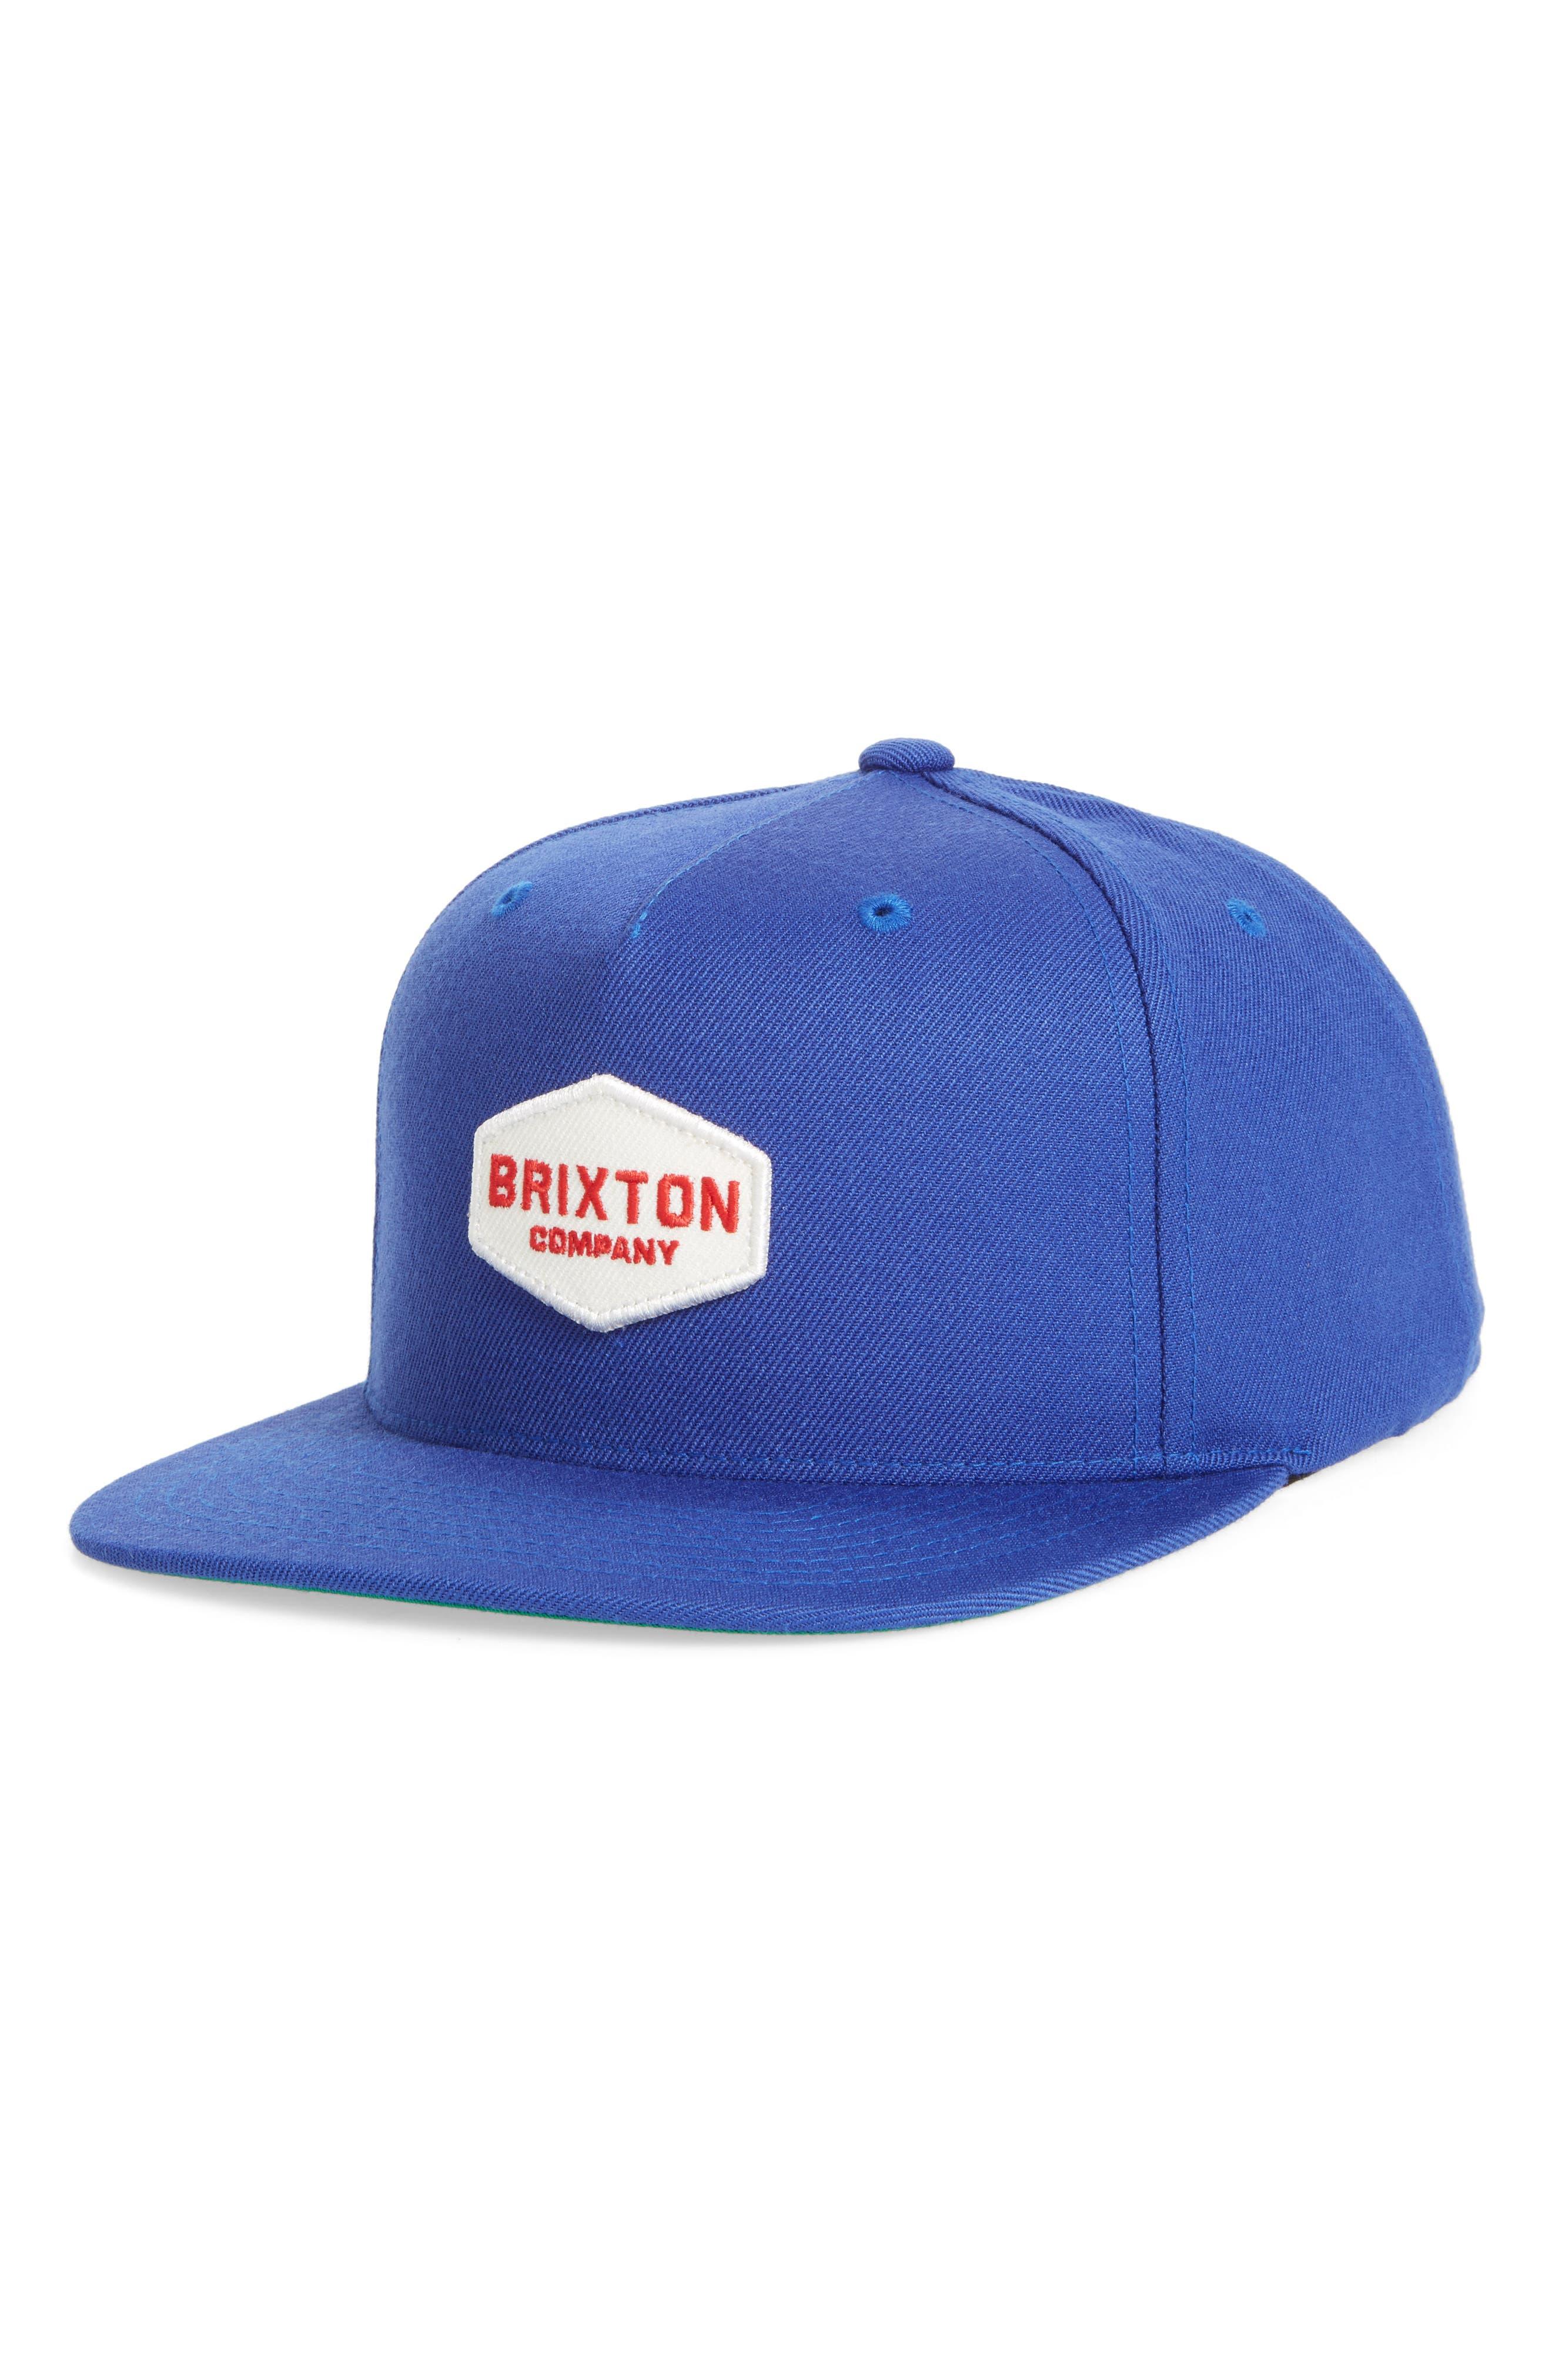 Brighton Obtuse Snapback Baseball Cap,                         Main,                         color, Dark Royal